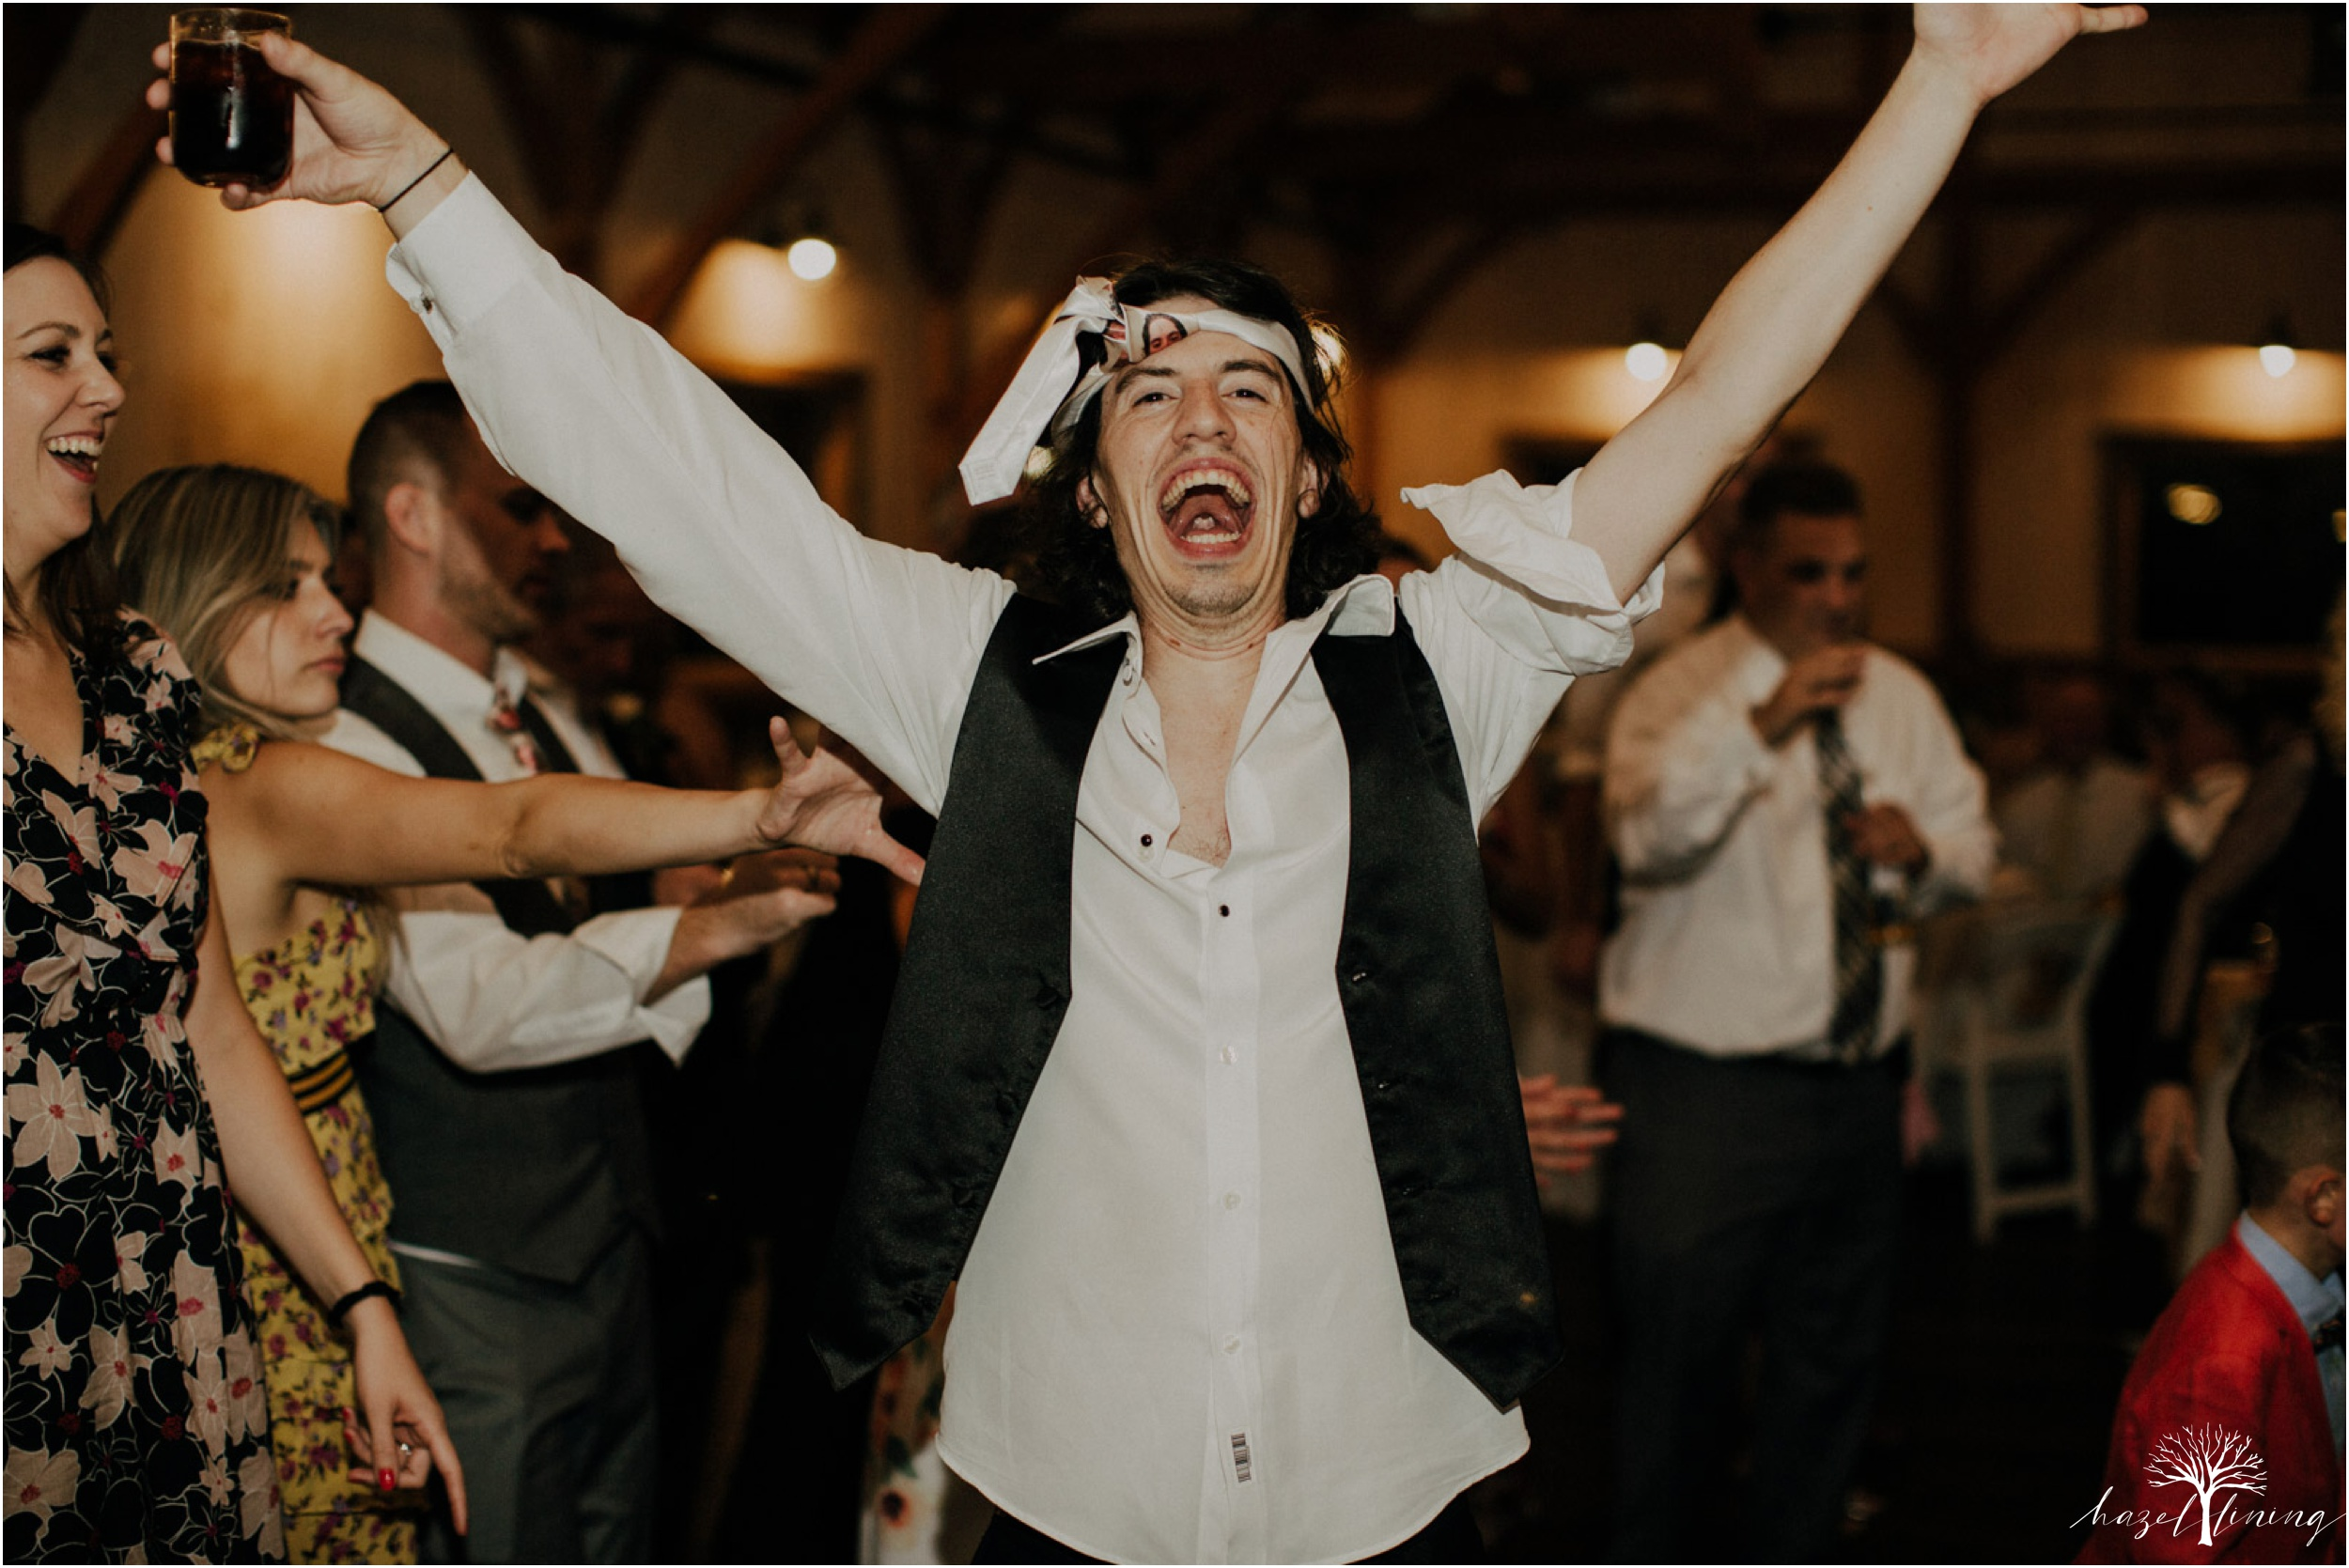 maureen-hepner-anthony-giordano-rose-bank-winery-newtow-pennsylvania-luxury-summer-wedding-hazel-lining-photography-destination-elopement-wedding-engagement-photography_0149.jpg